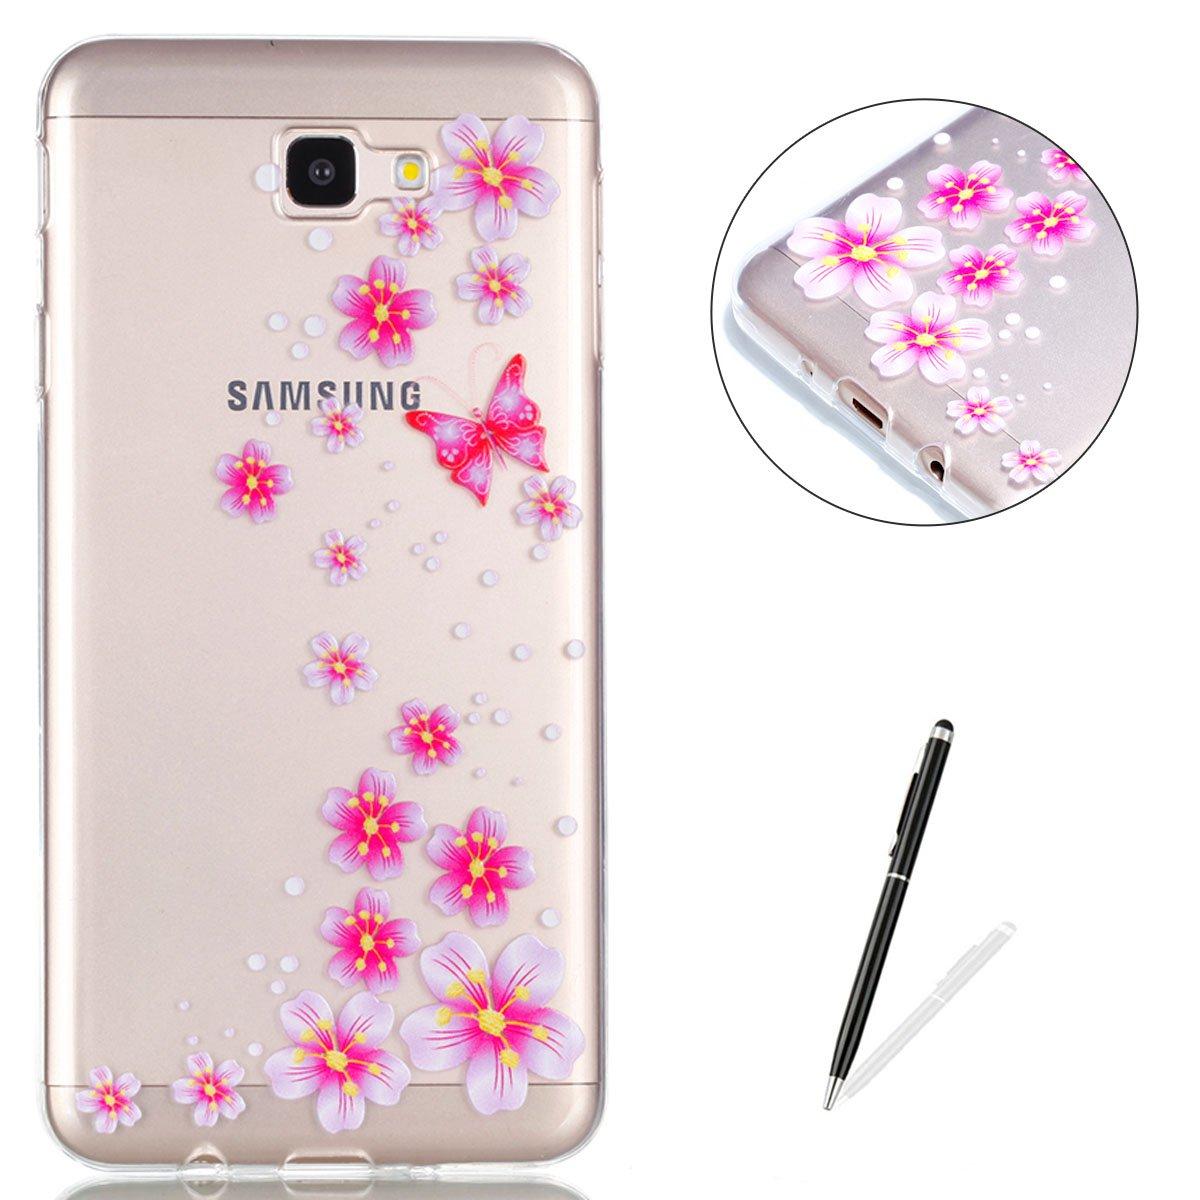 f8af6dffc3e outlet Samsung Galaxy J7 Prime Cristal Claro Funda KaseHom Pintura del arte  Espalda TPU Premium y